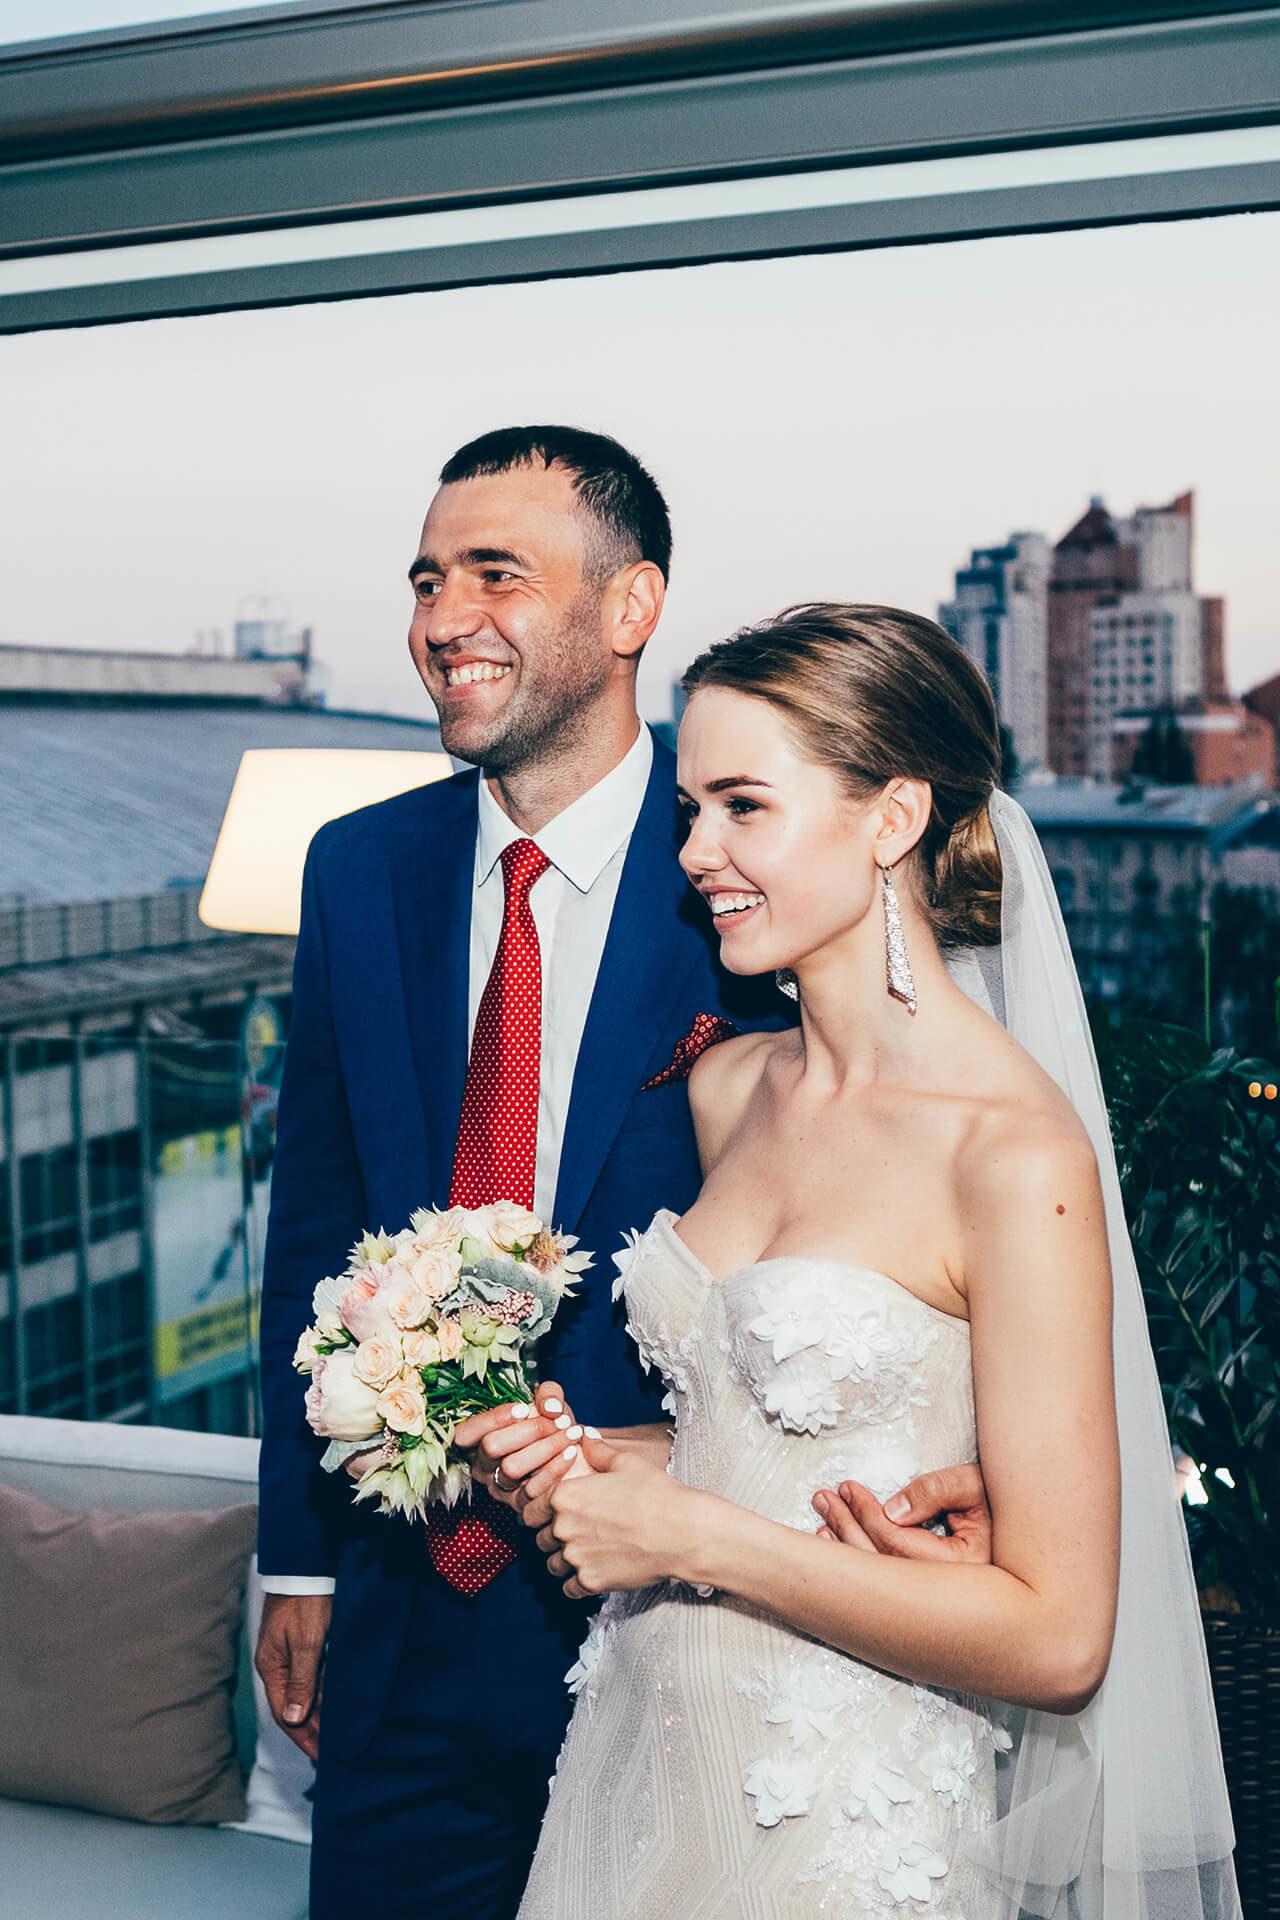 Популярный Youtube-блогер Маша Тимошенко вышла замуж в платье от Anne-Mariee